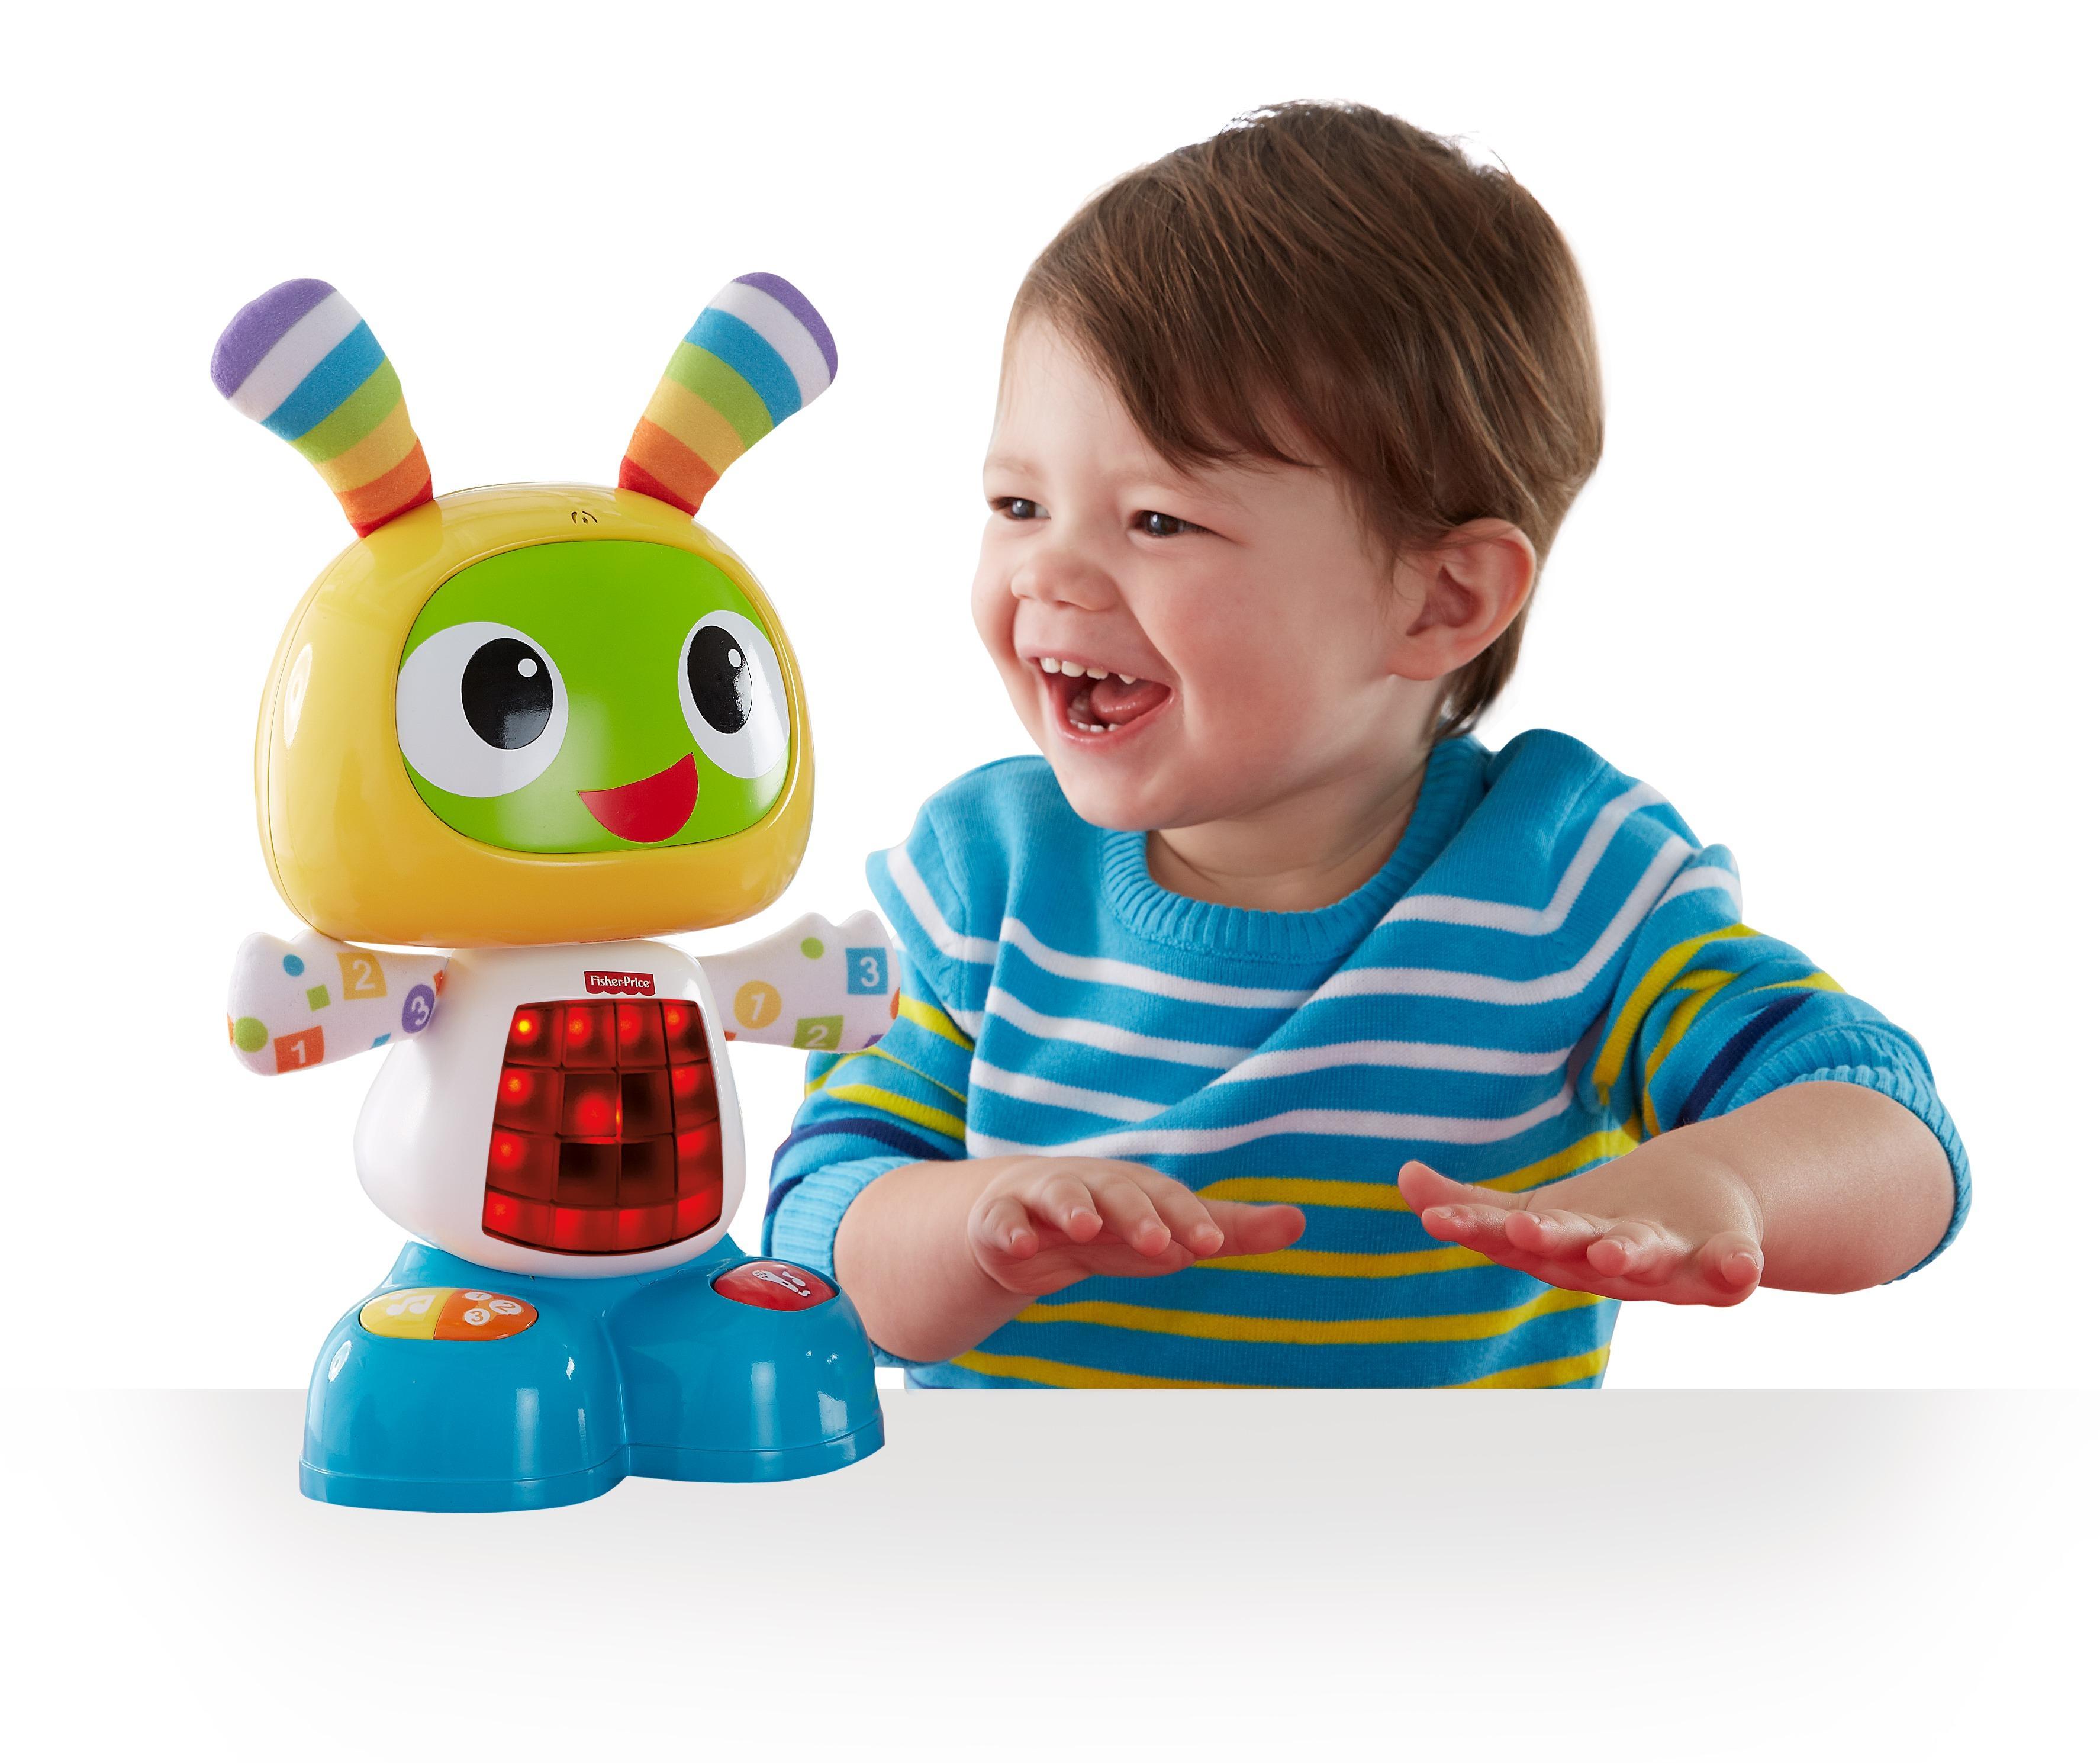 fisher price a1504206 bebo le robot jouet de premier. Black Bedroom Furniture Sets. Home Design Ideas